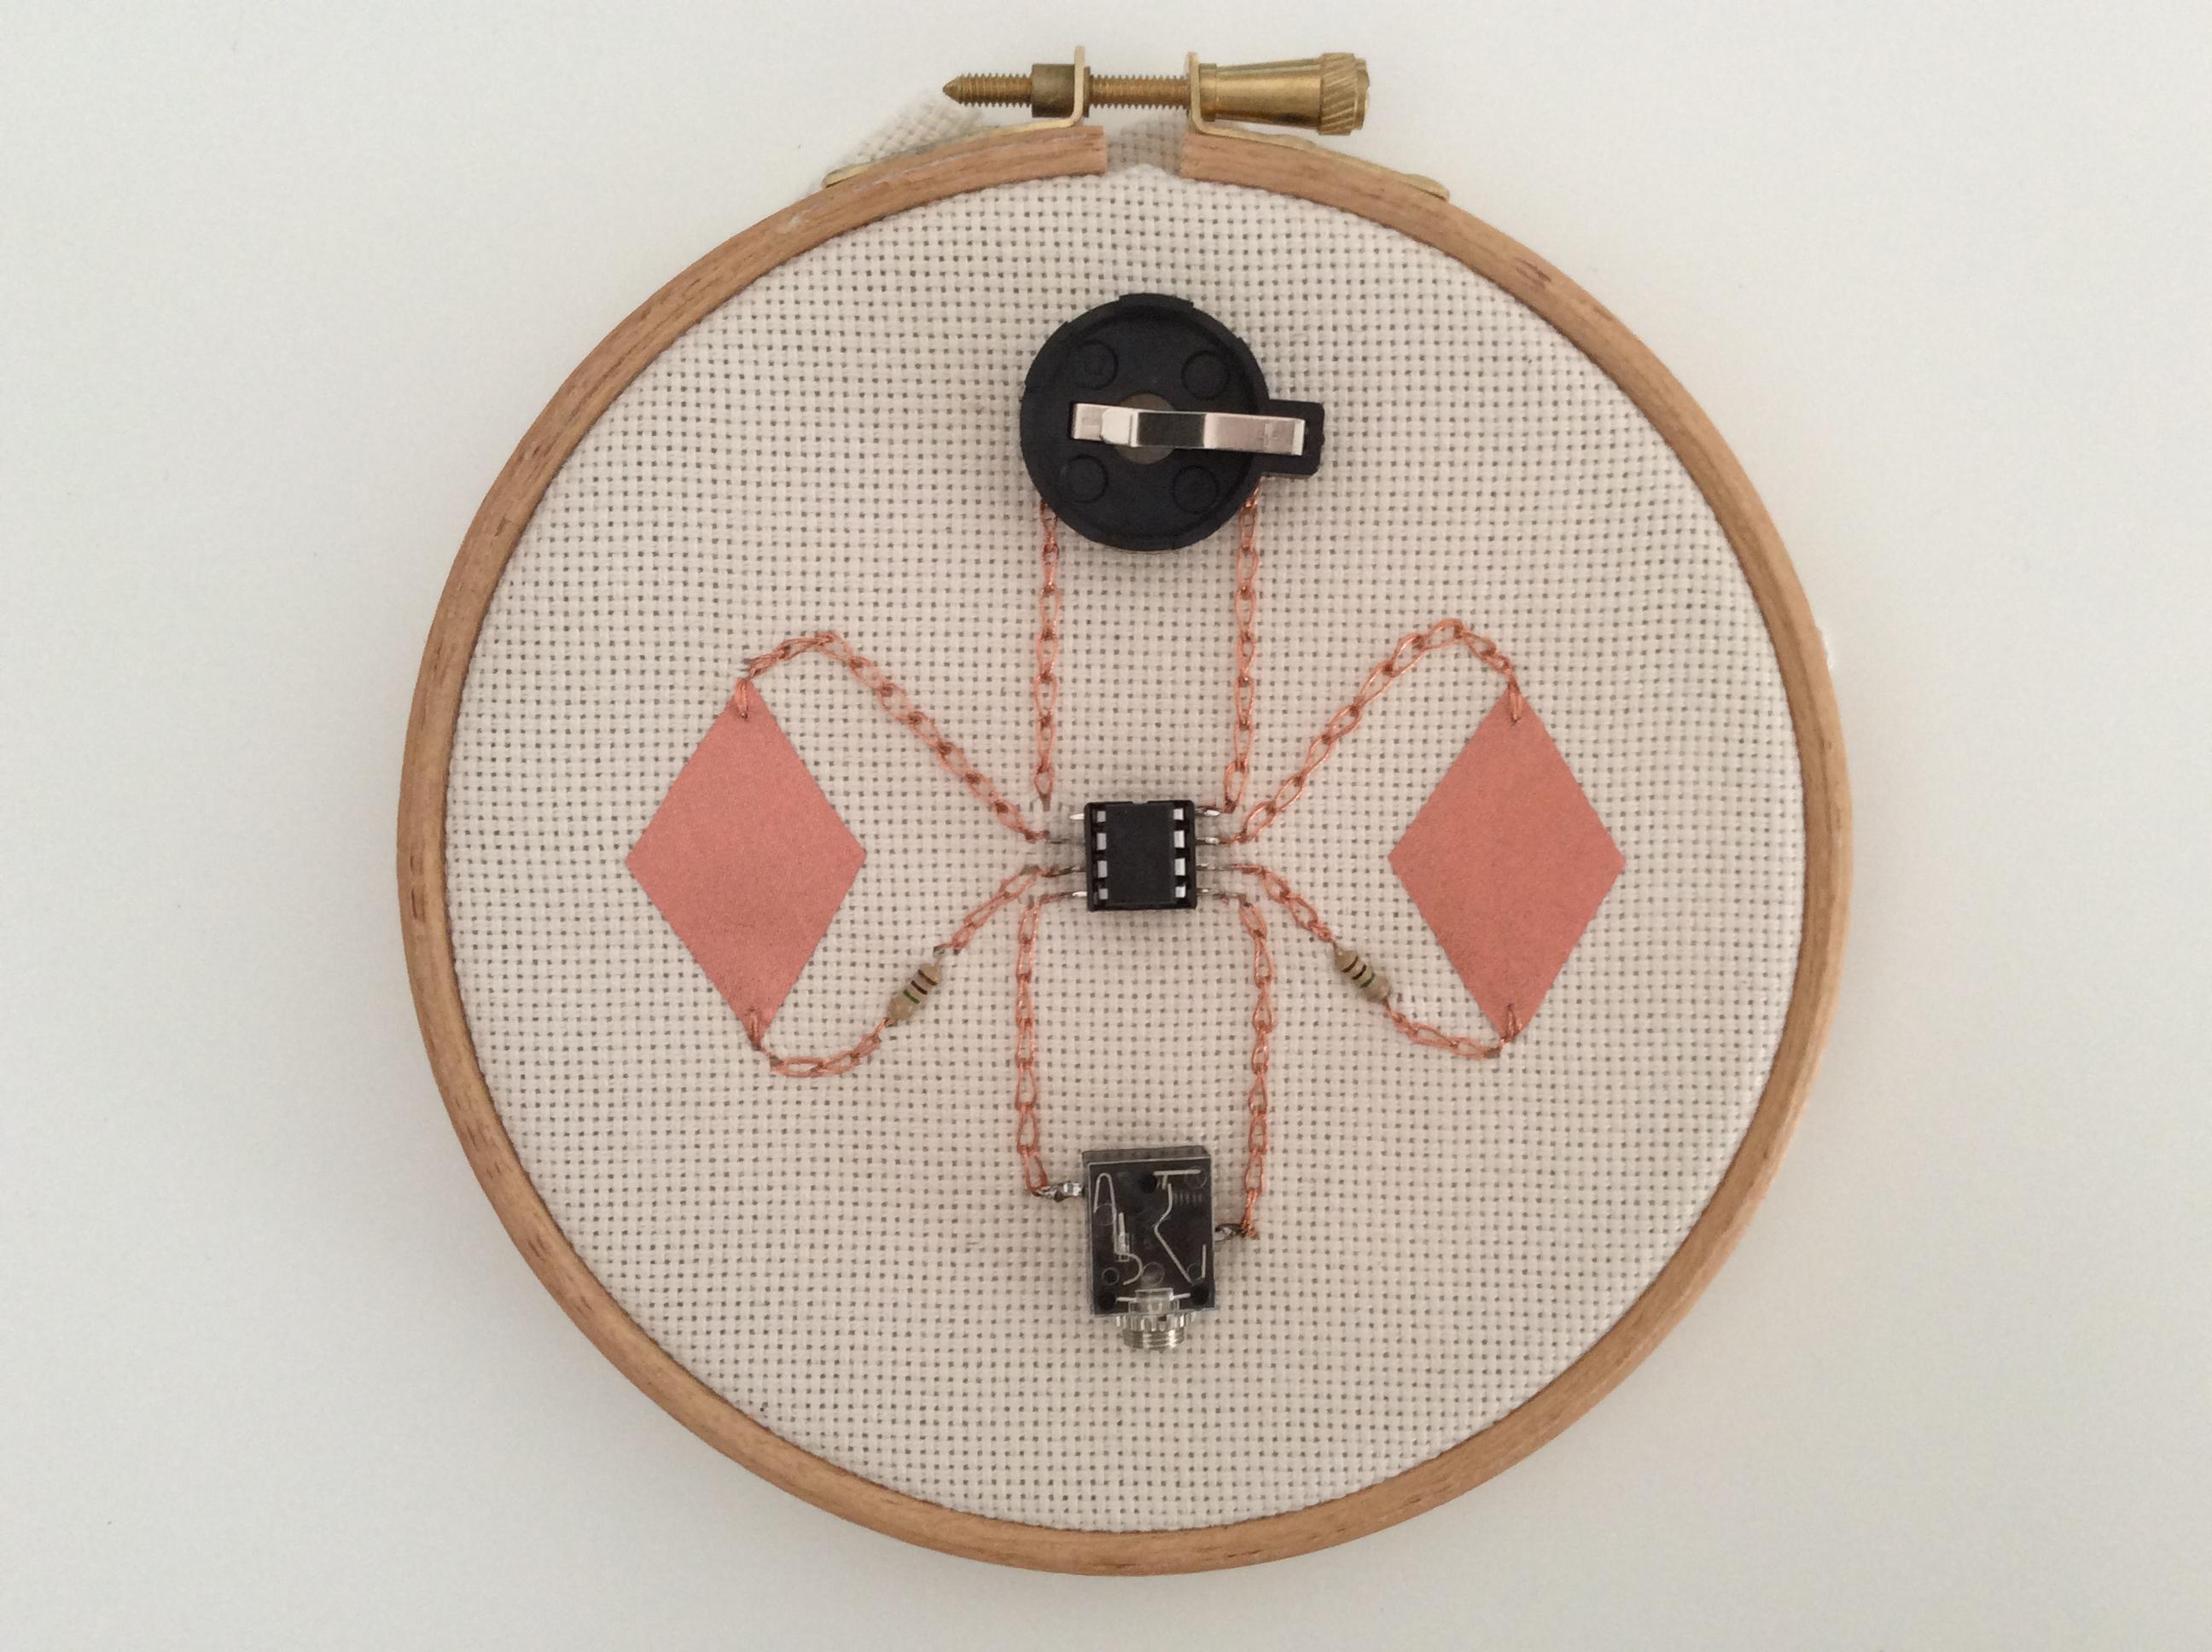 Hand Embroidery + Intro to E-Textiles